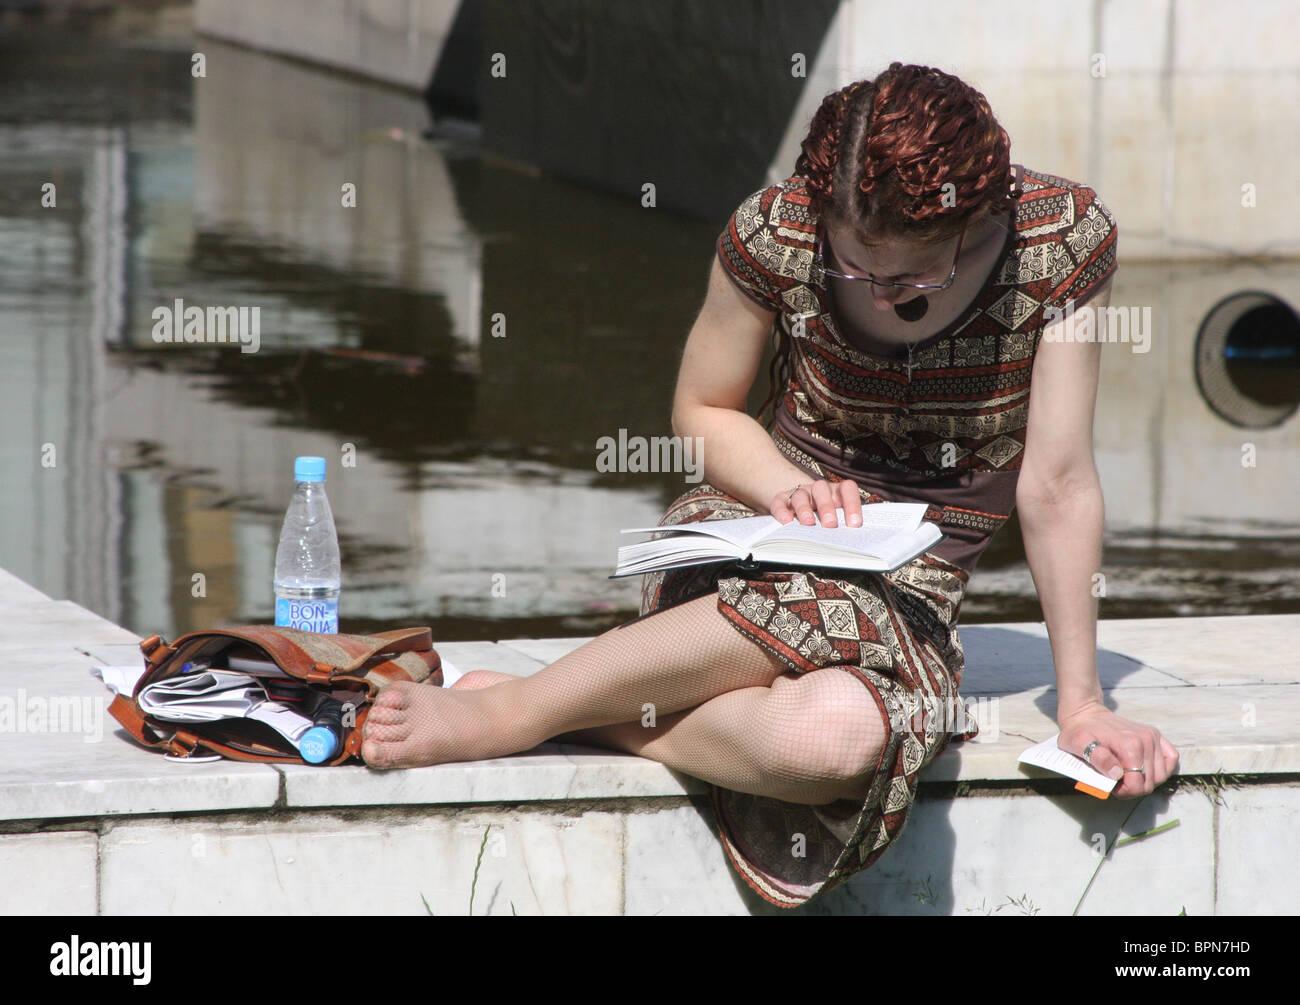 2009 International Book Festival - Stock Image